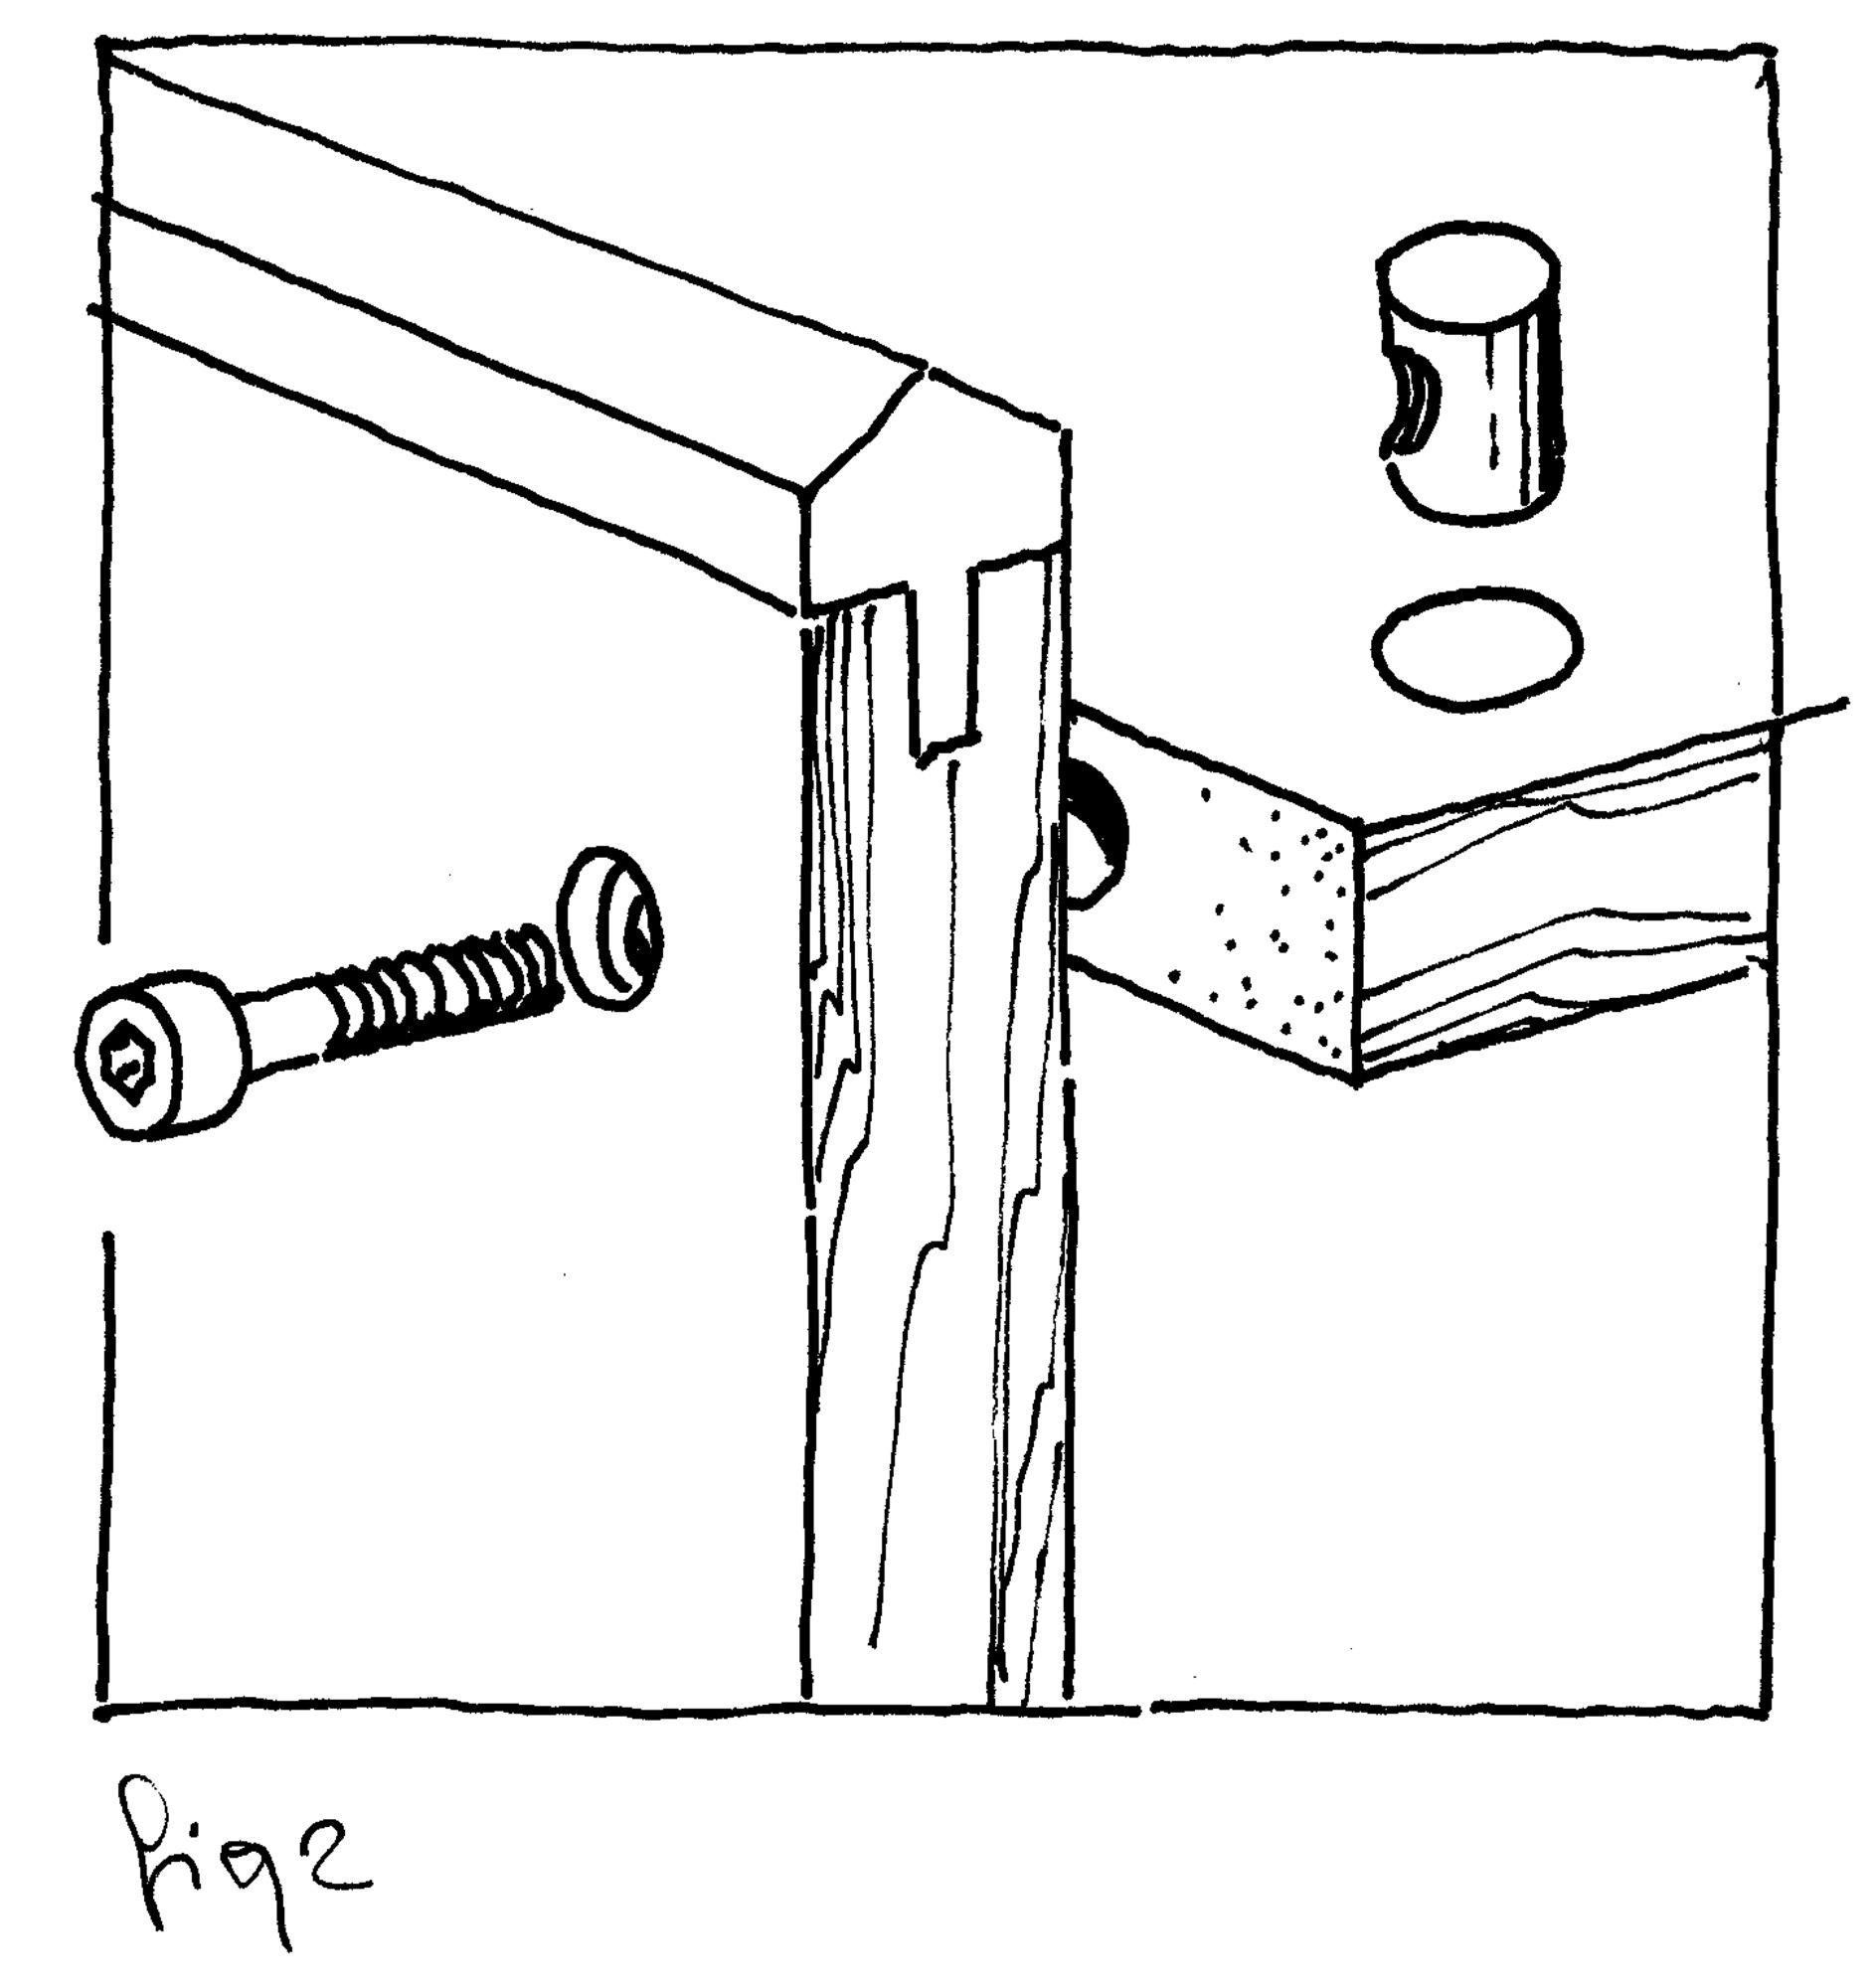 Decoplan meubelen De Coene 02